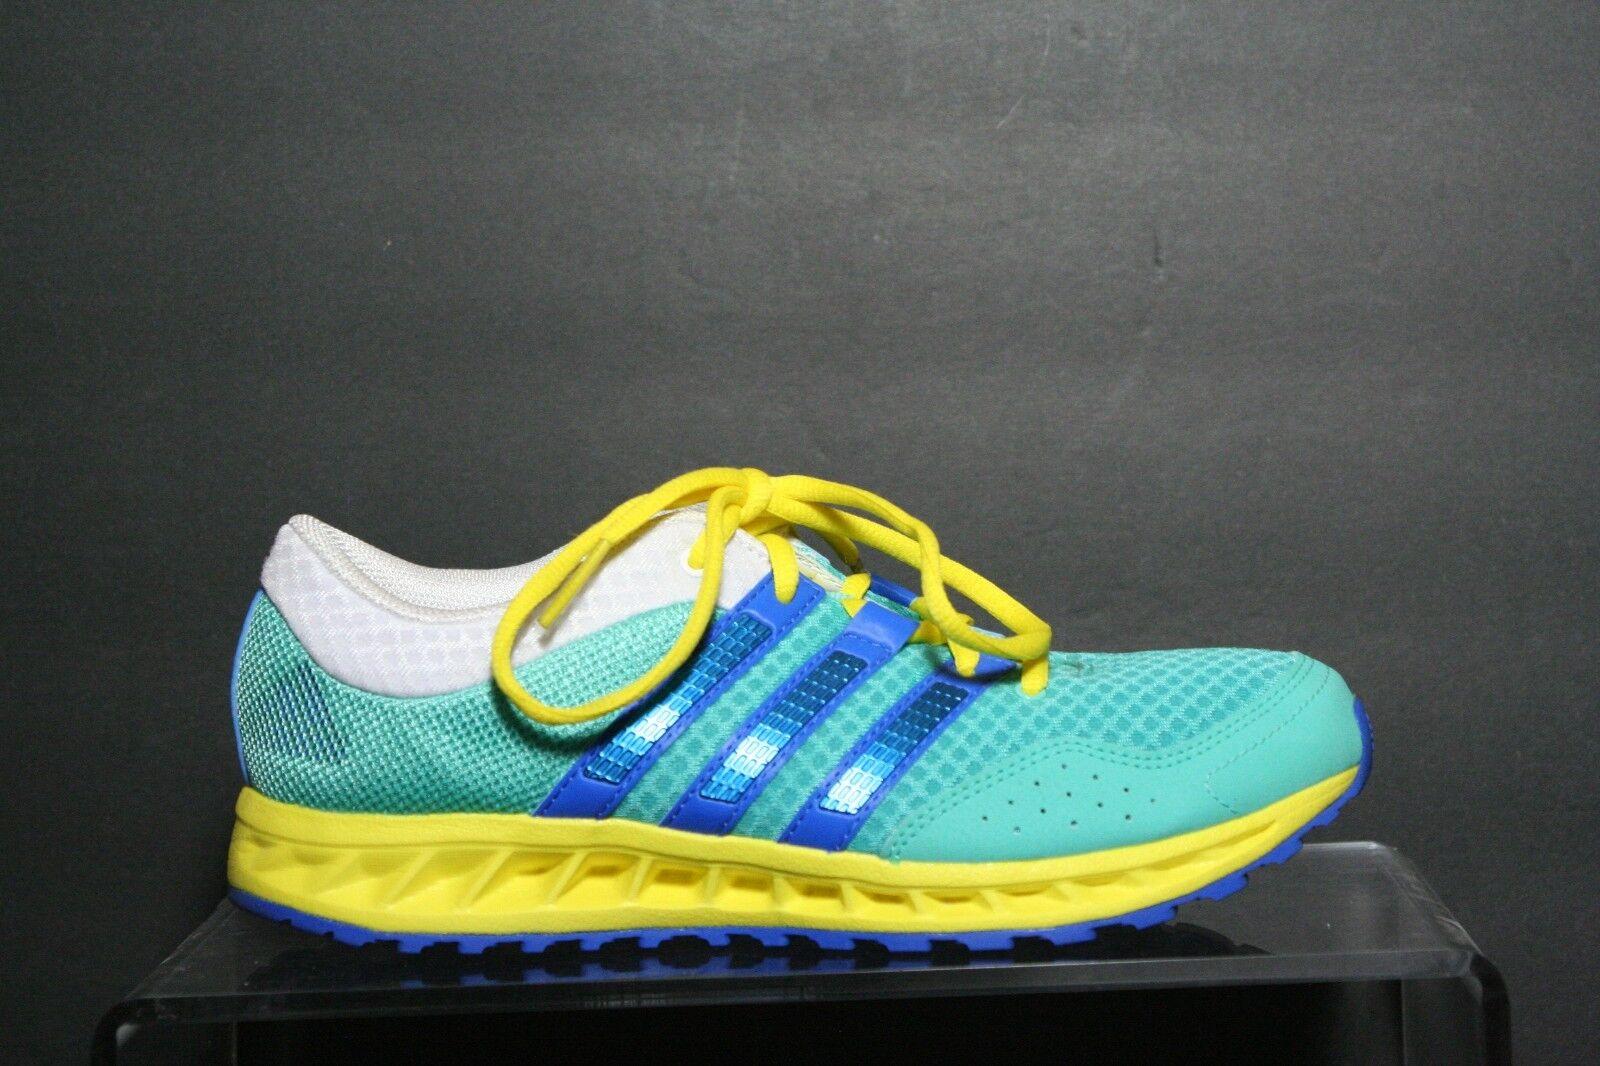 Adidas MI Custom Running 2014 Women 7 Multi Teal Yellow White Blue Training EUC